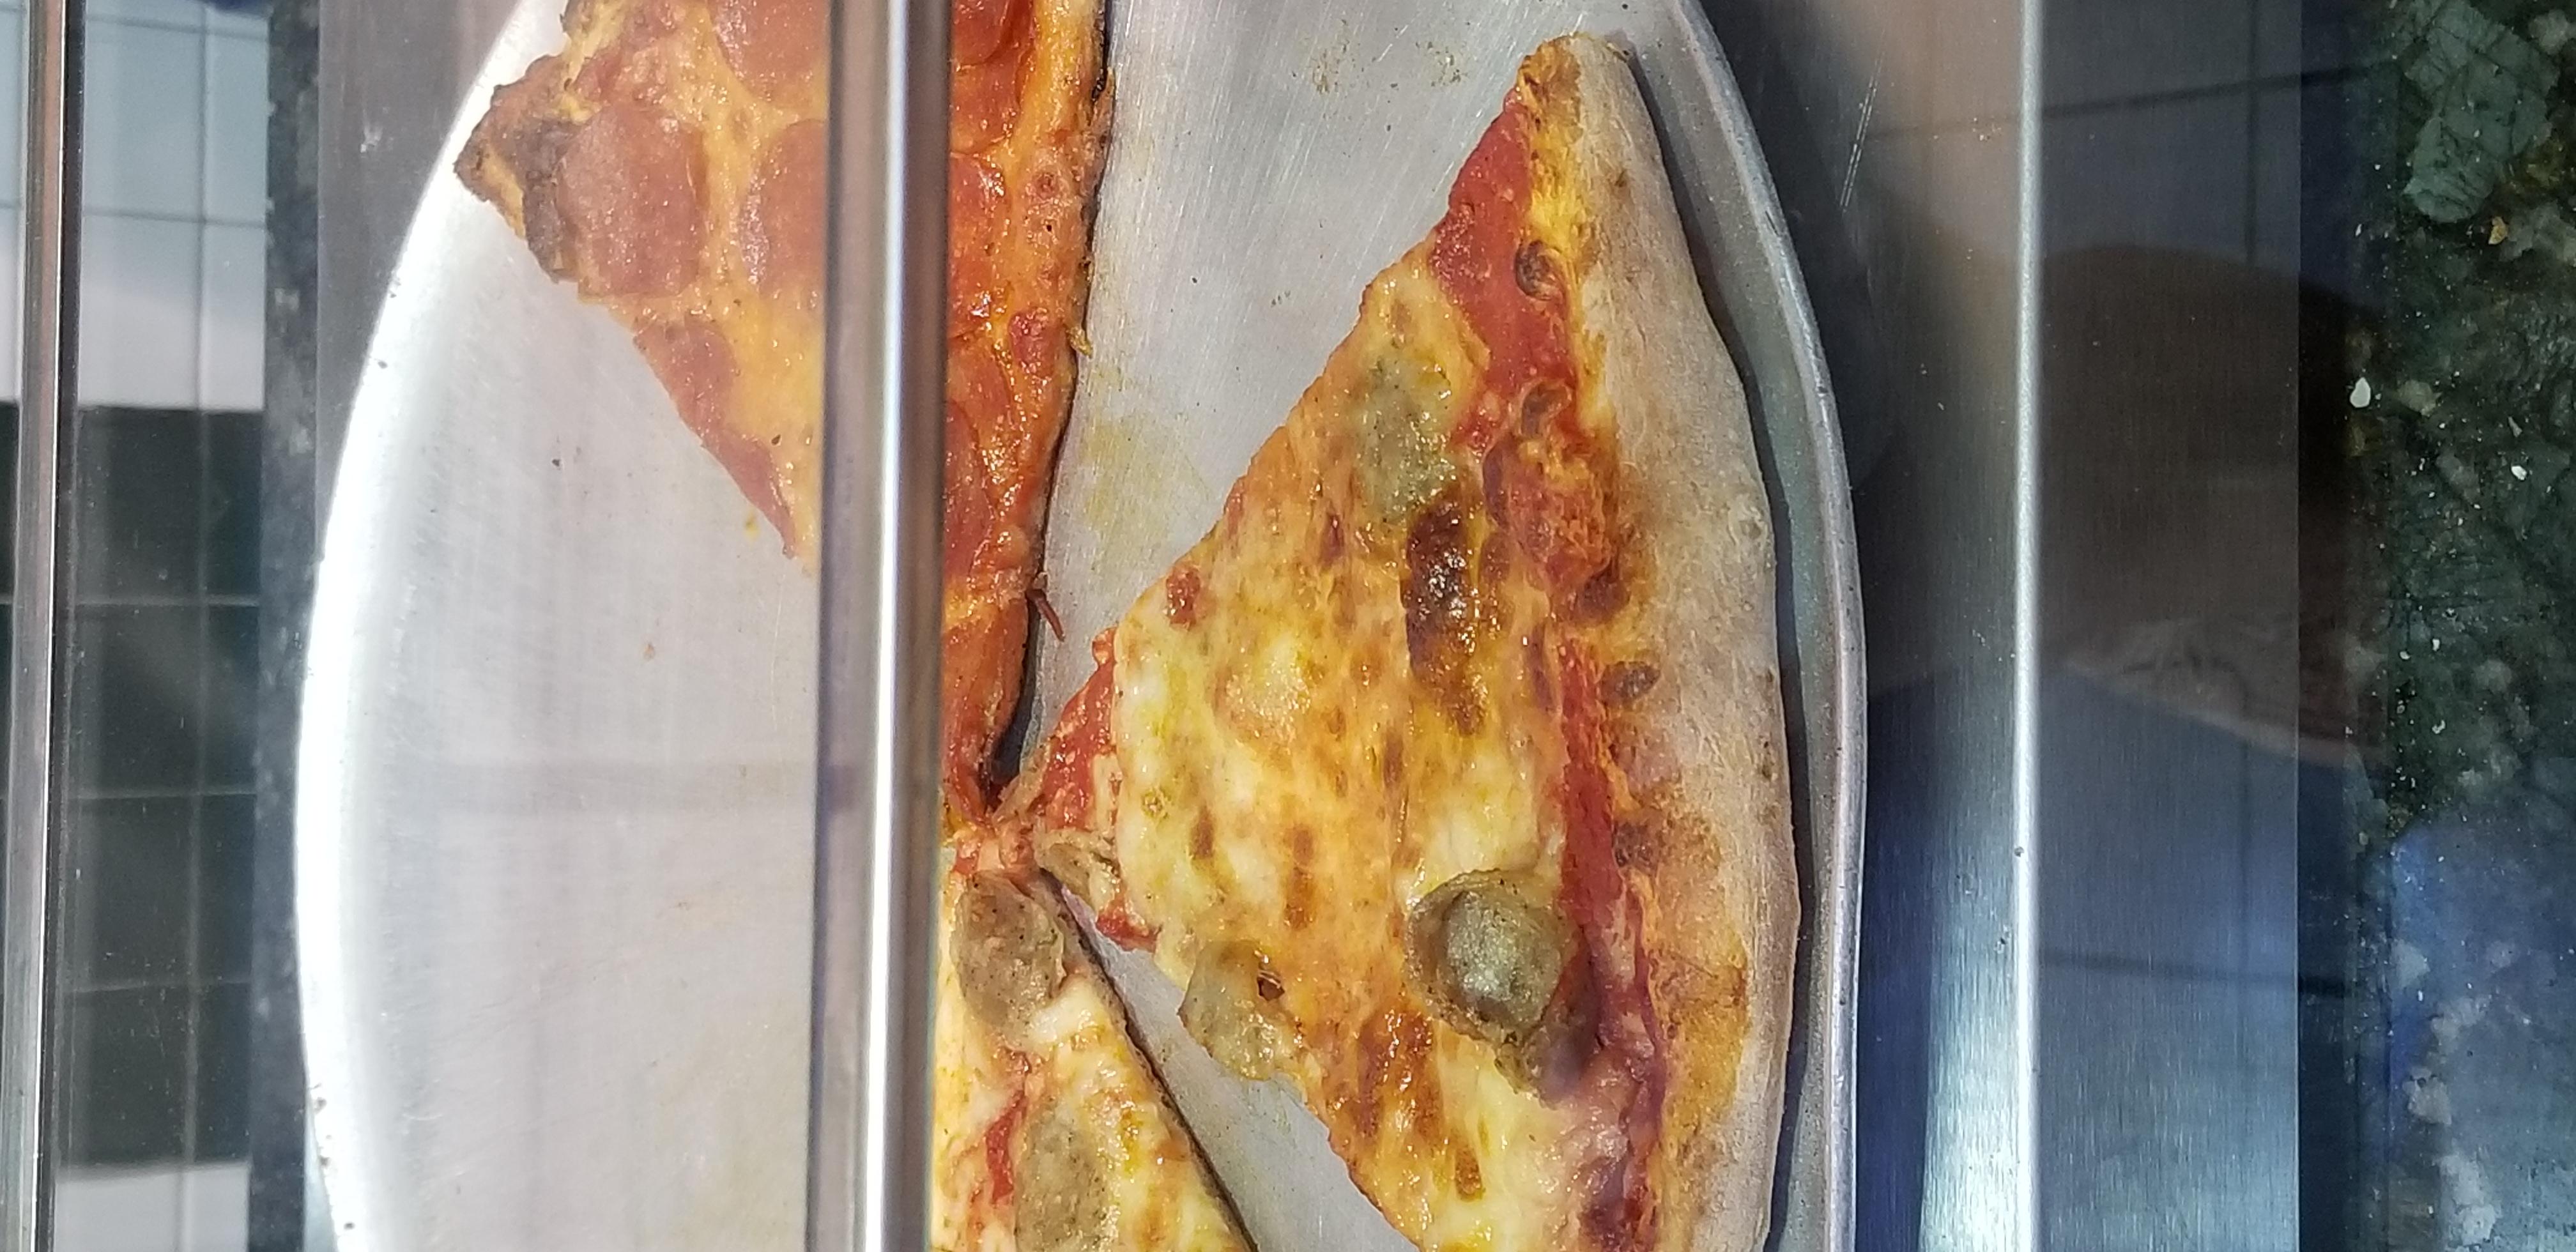 laura.lebeau on One Bite Pizza App